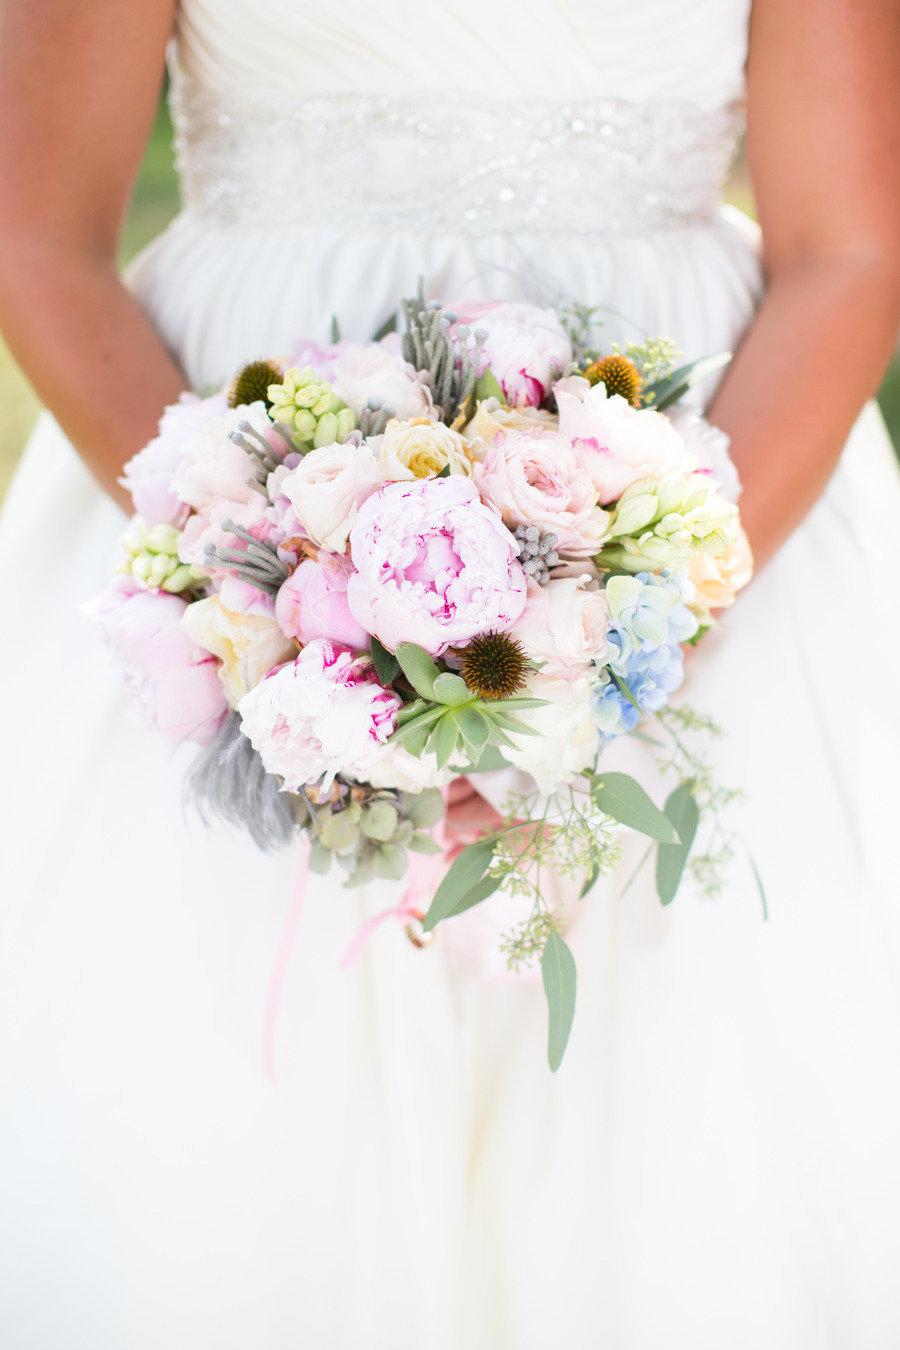 STYLE ME PRETTY: CAROLINE & ADAM'S CLASSIC COUNTRY WEDDING